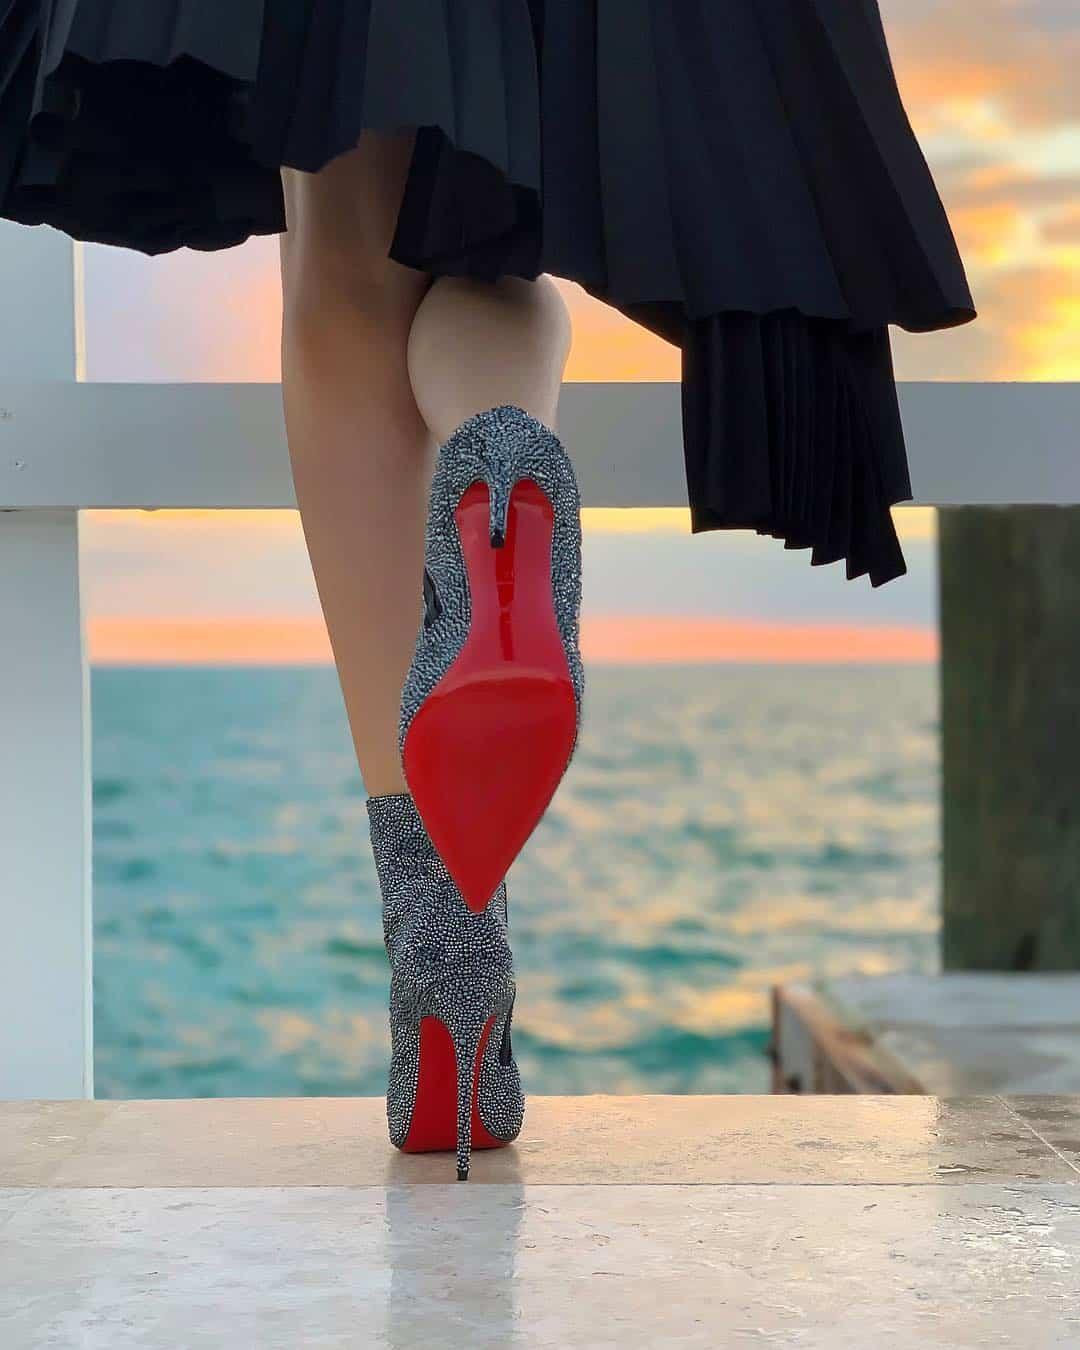 Chrisitian Louboutin red bottom shoes